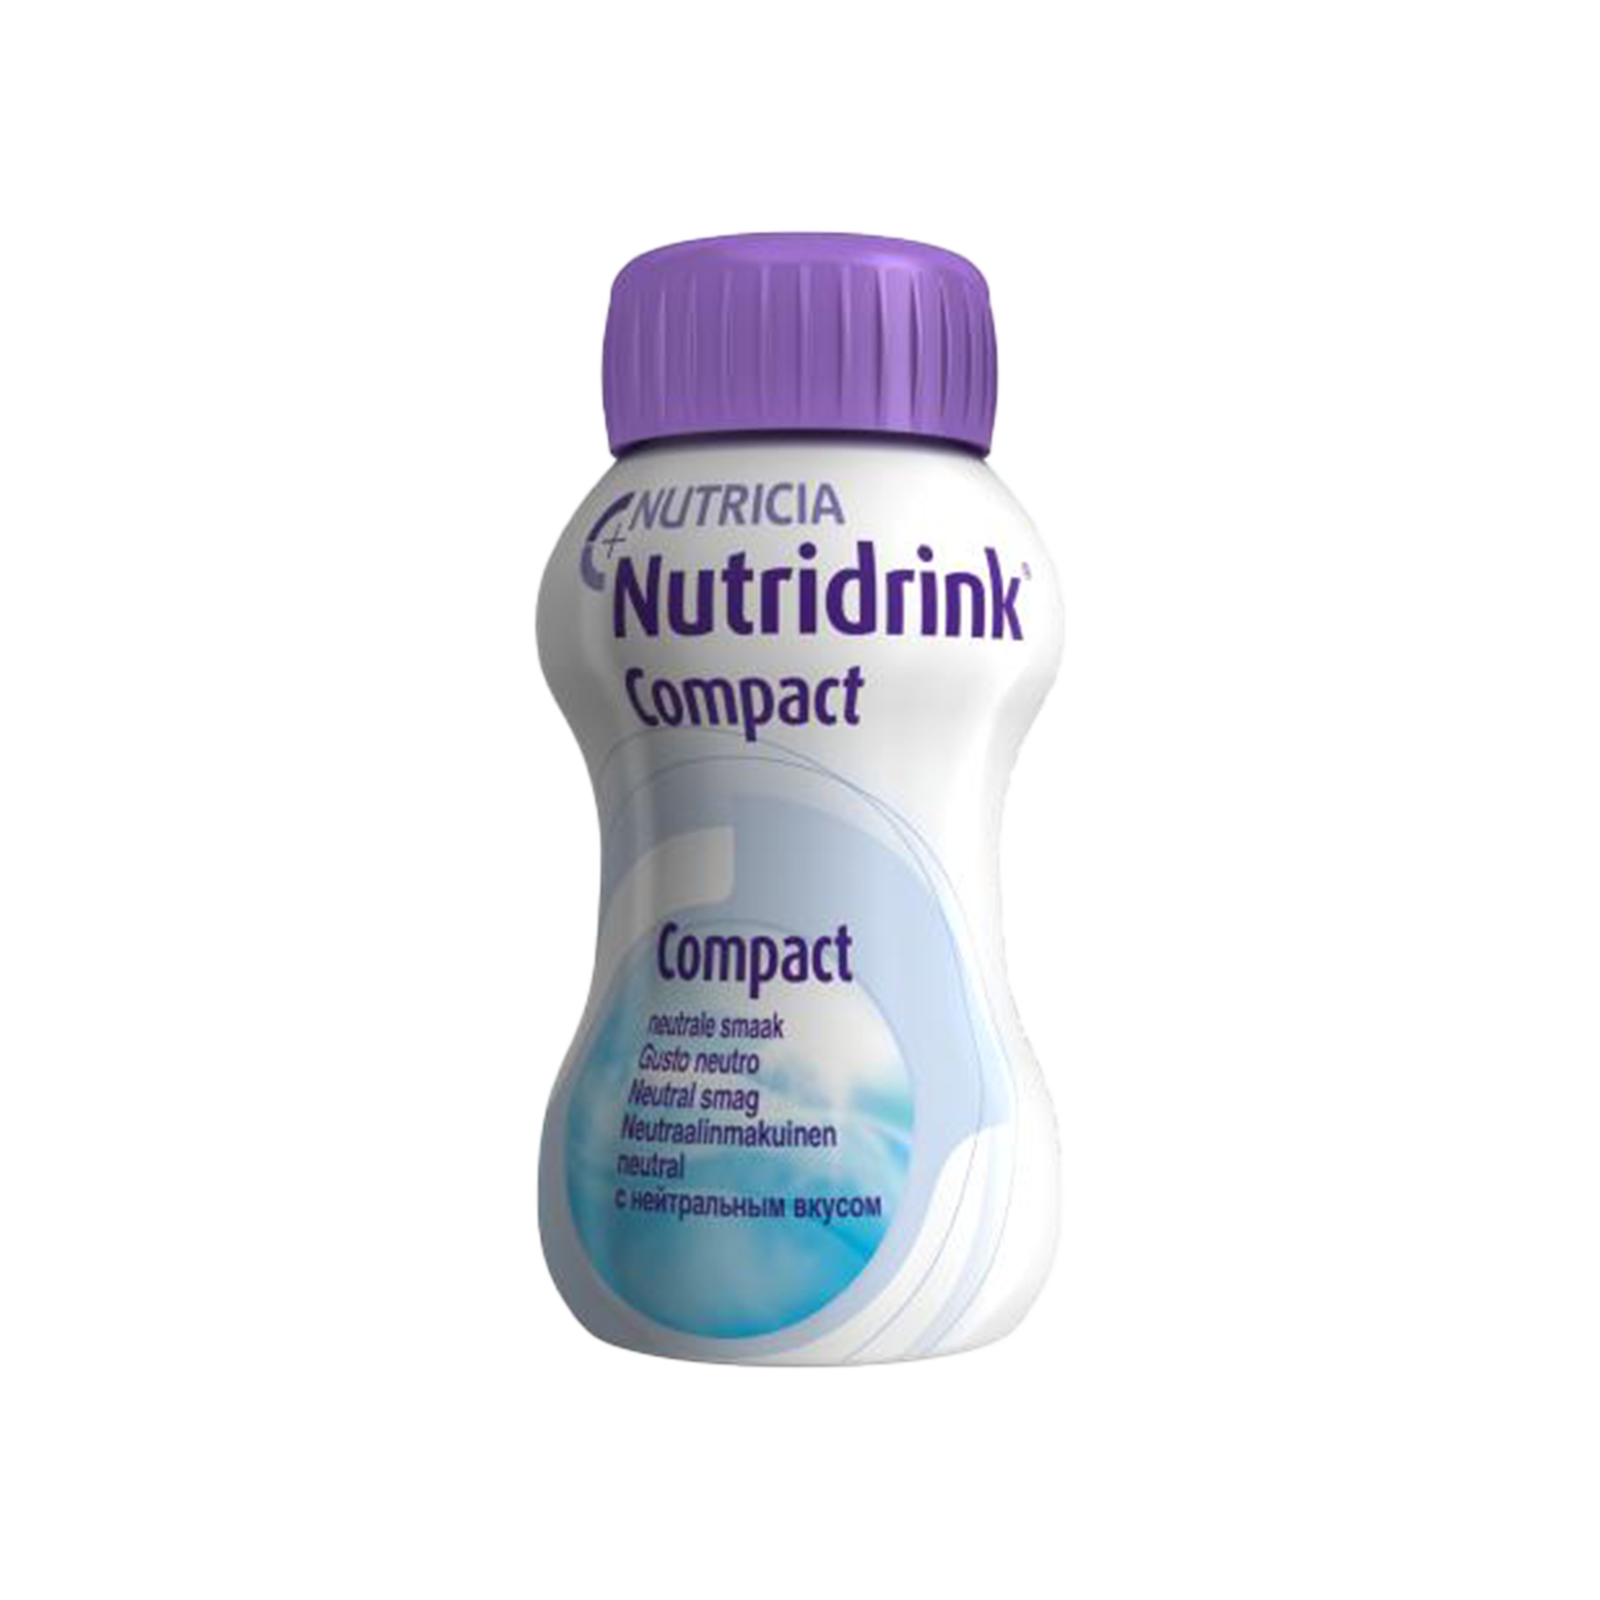 Nutridrink Compact neutro 4x Bottiglia 125 ml | Nutricia